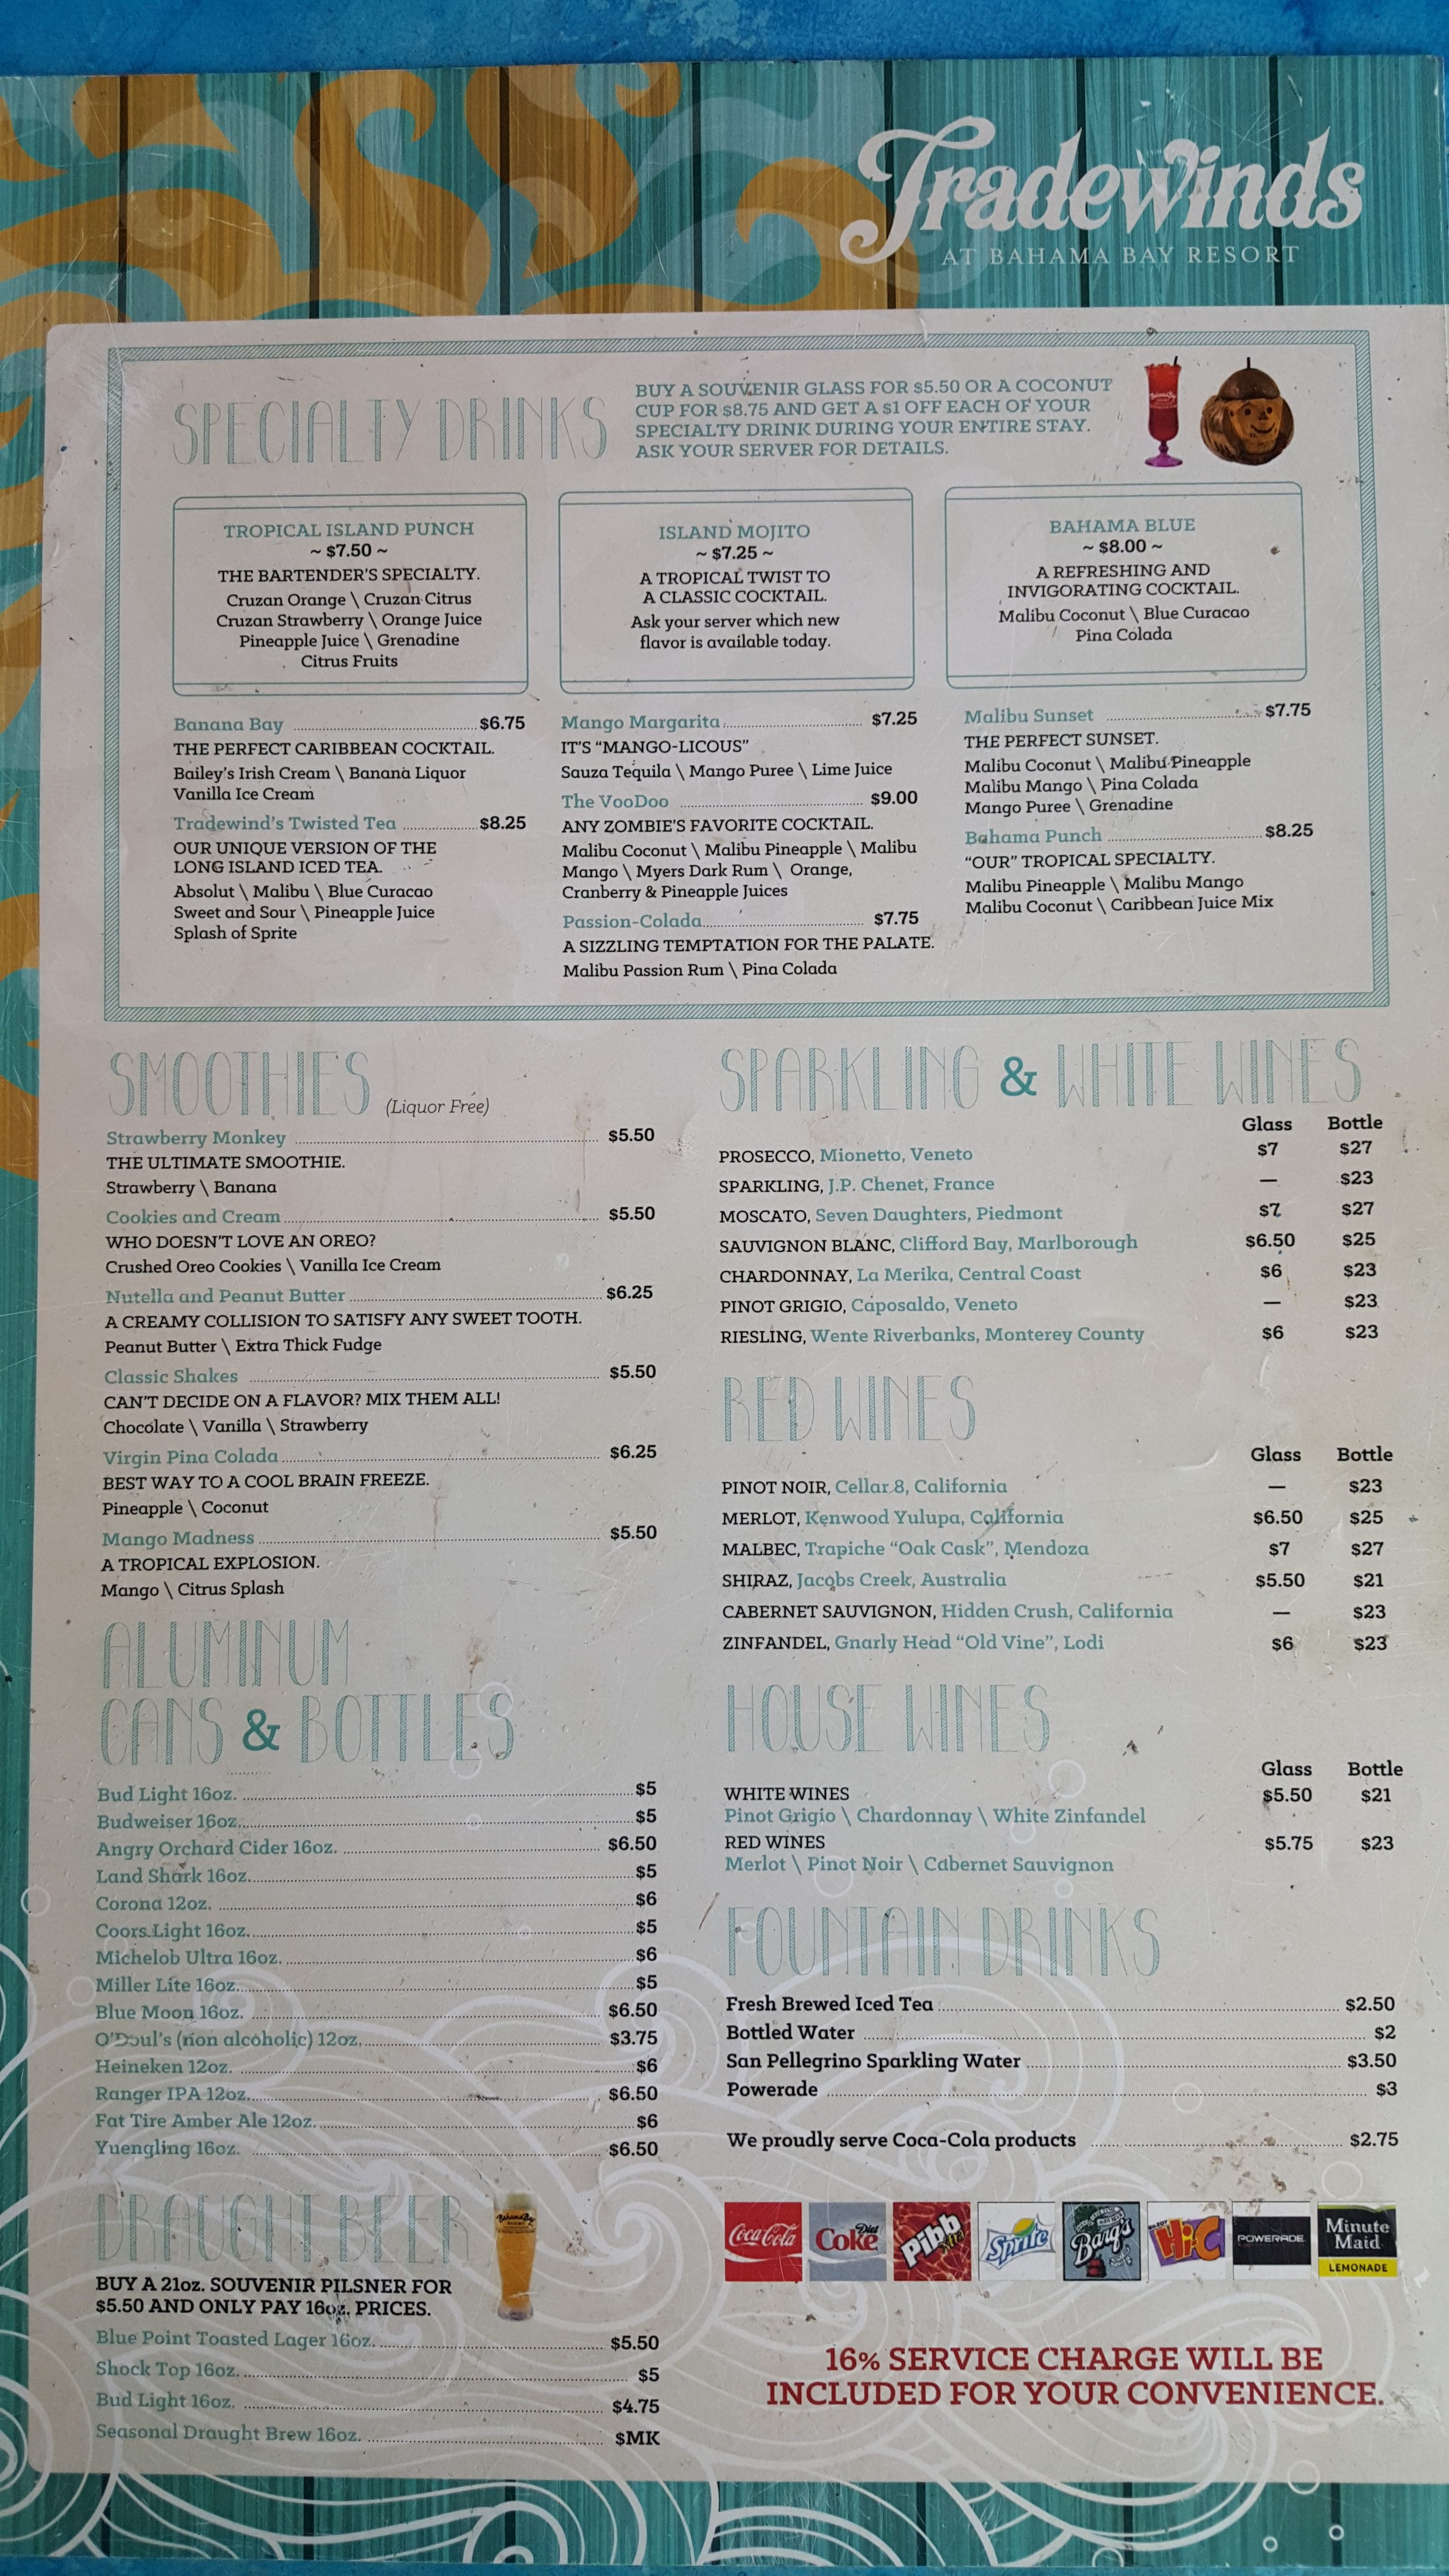 Tradewinds Restaurant Menu Drinks